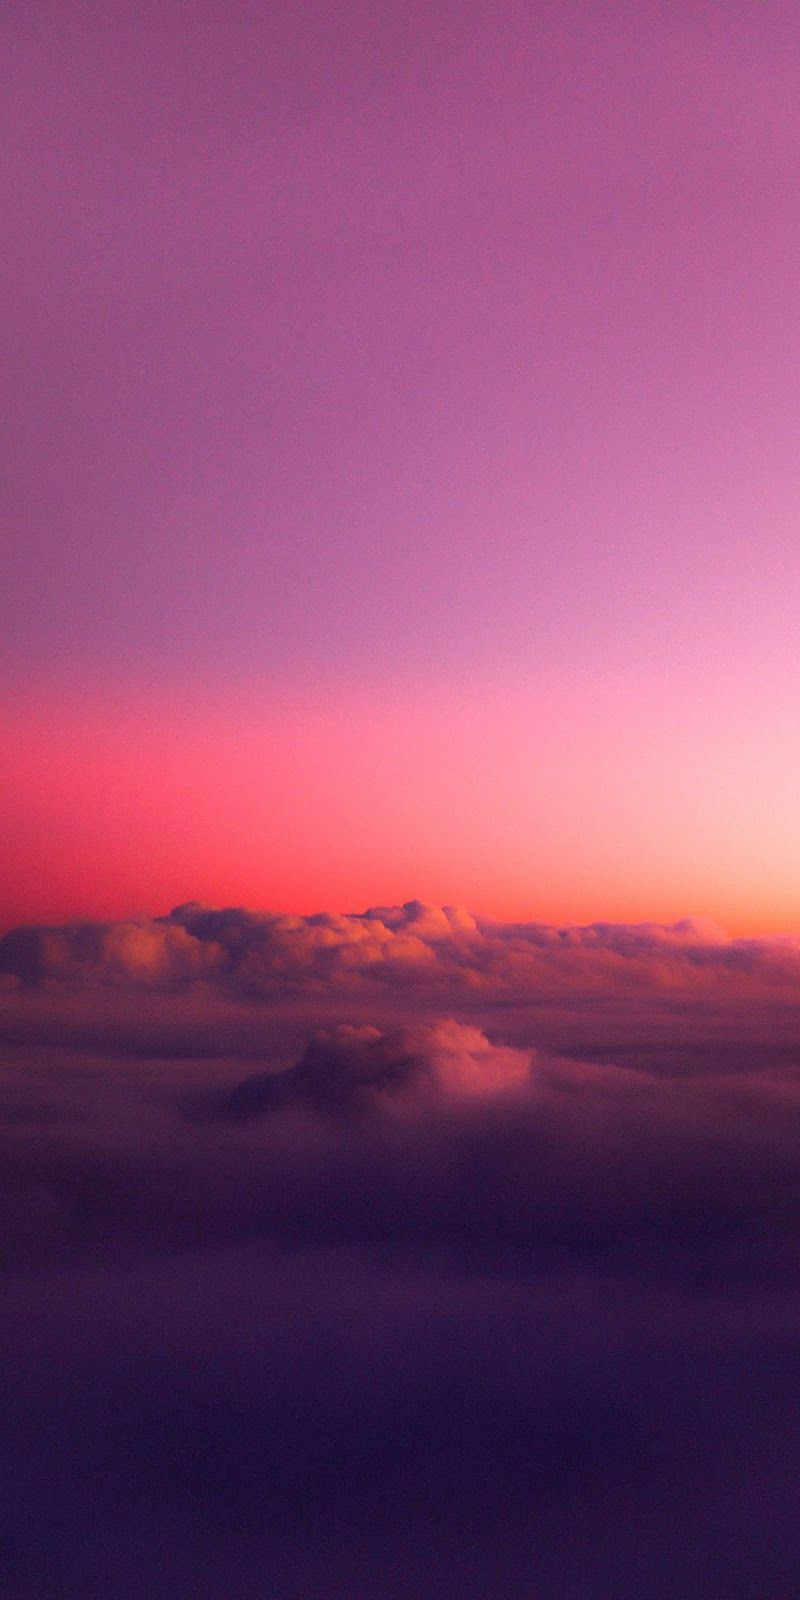 Cloud In The Twilight Sky Twilight Sky Sky Aesthetic Iphone Wallpaper Sky Hd wallpaper sky clouds sunset dusk